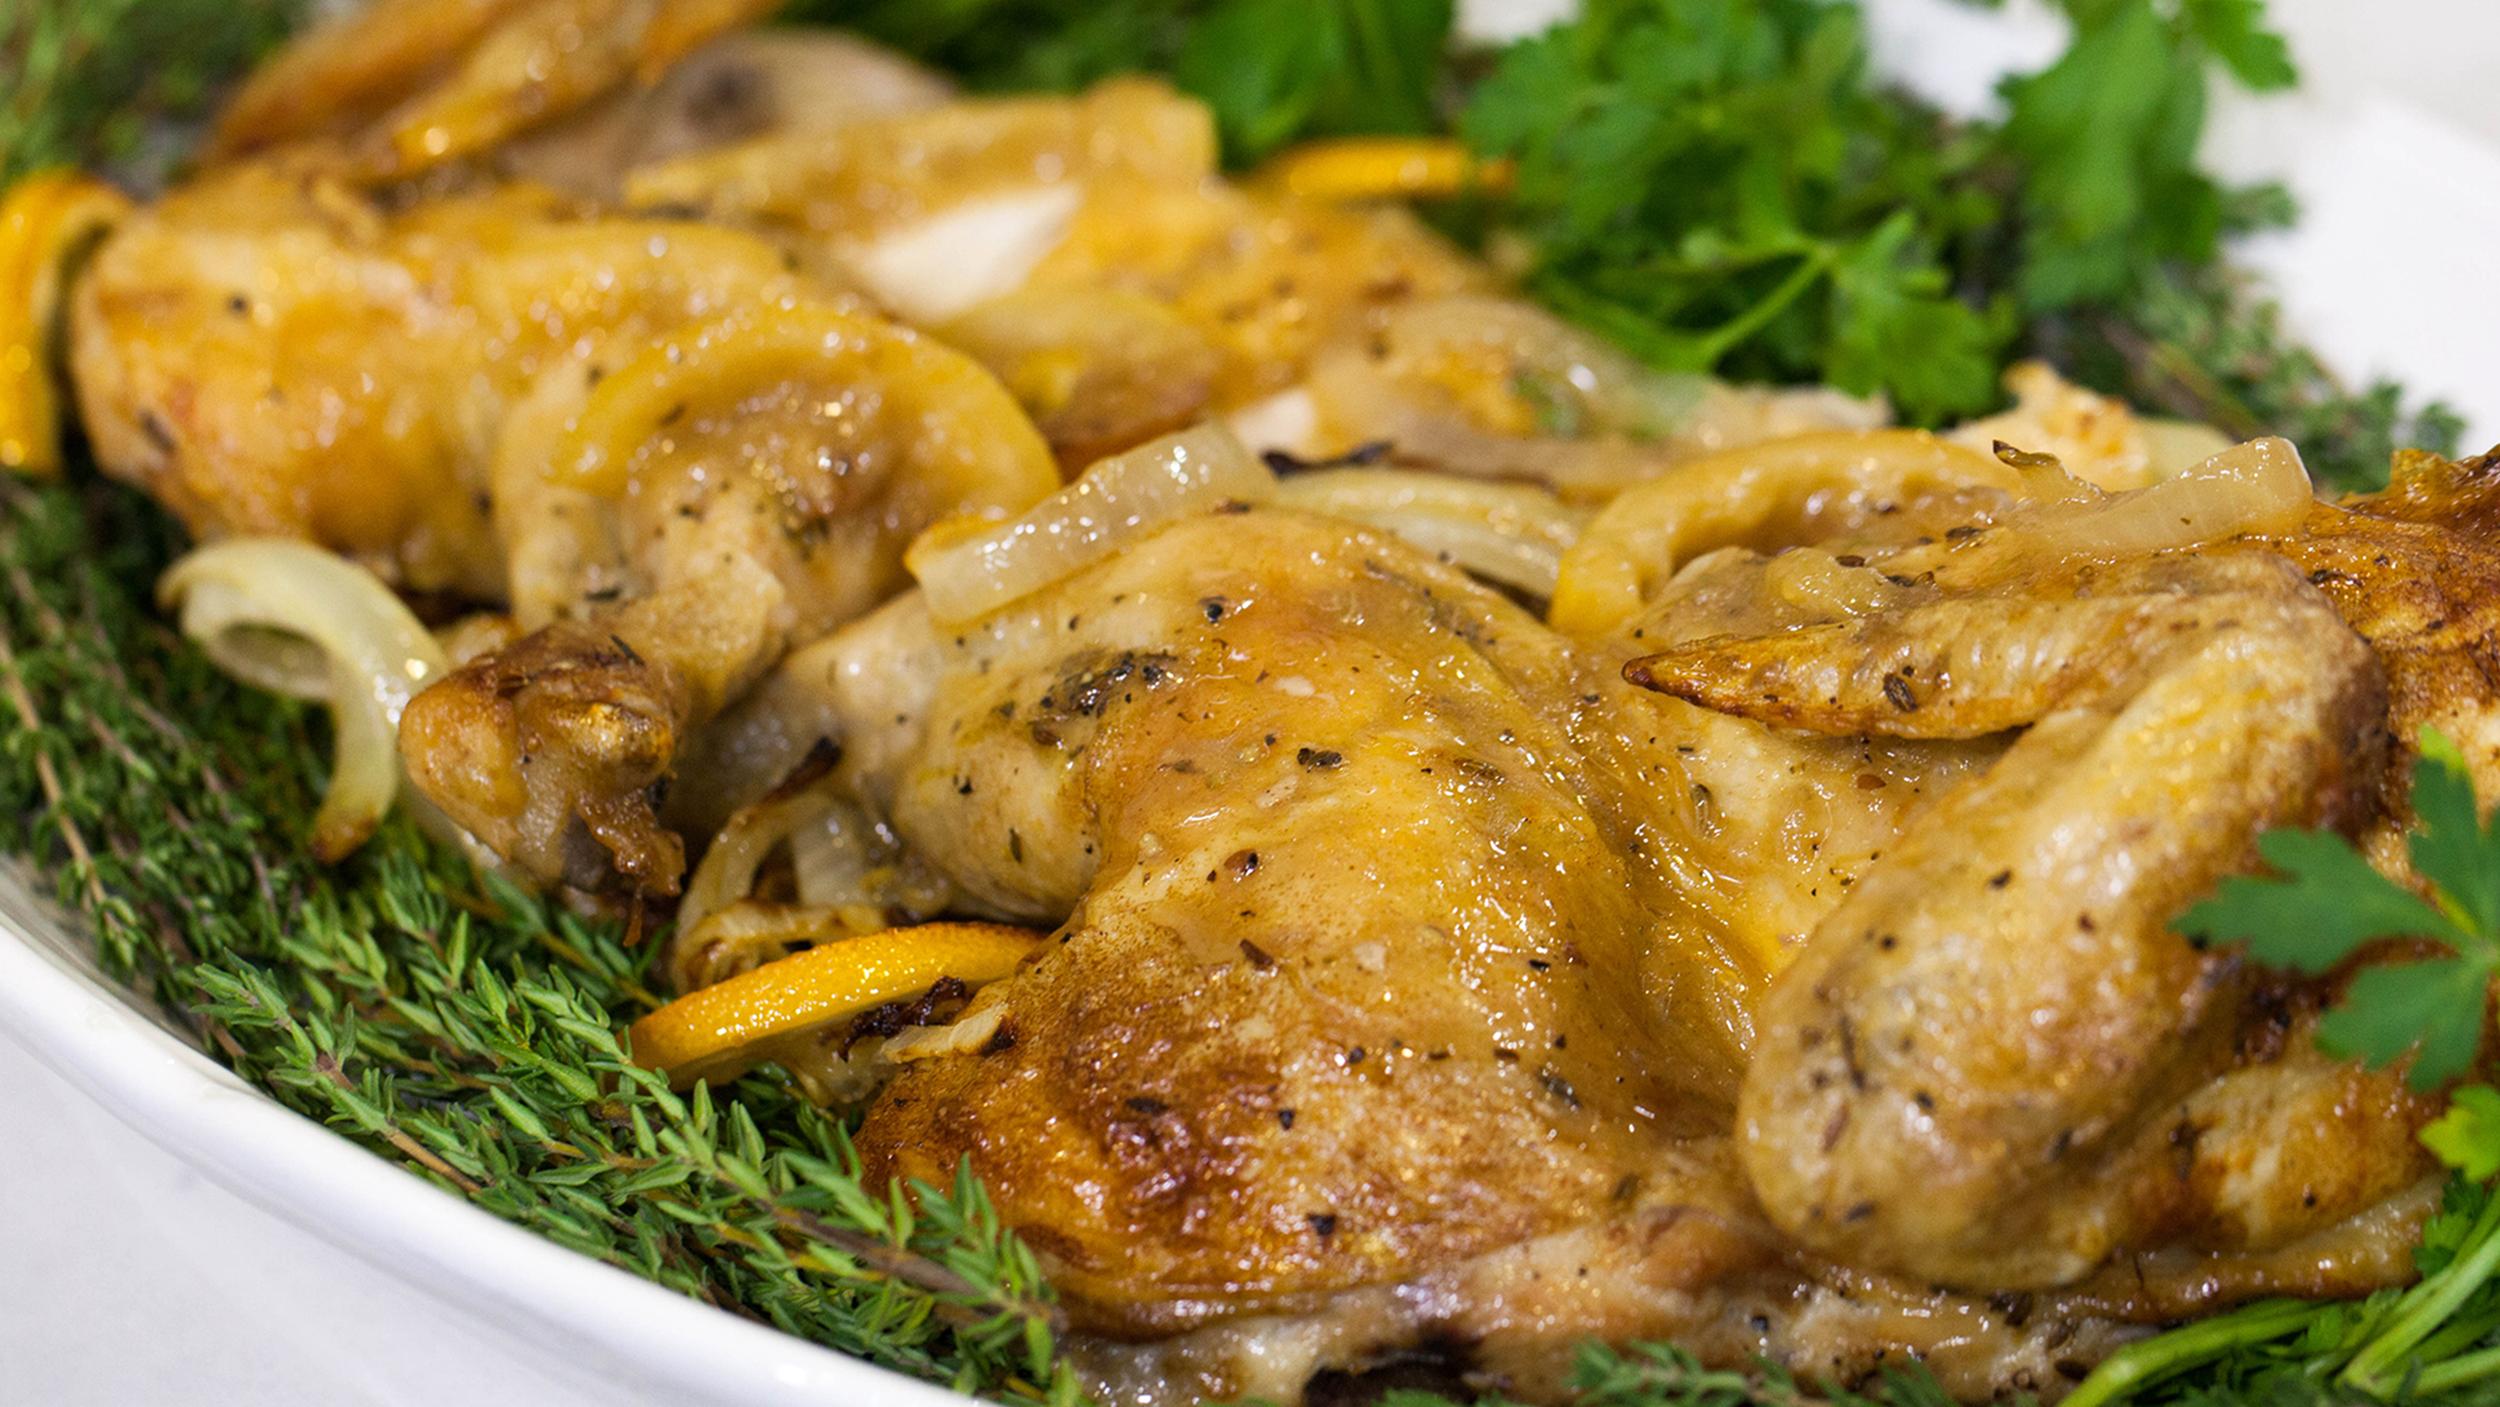 Barefoot Contessa Chicken ina garten's skillet chicken & broccolini is an easy dinner